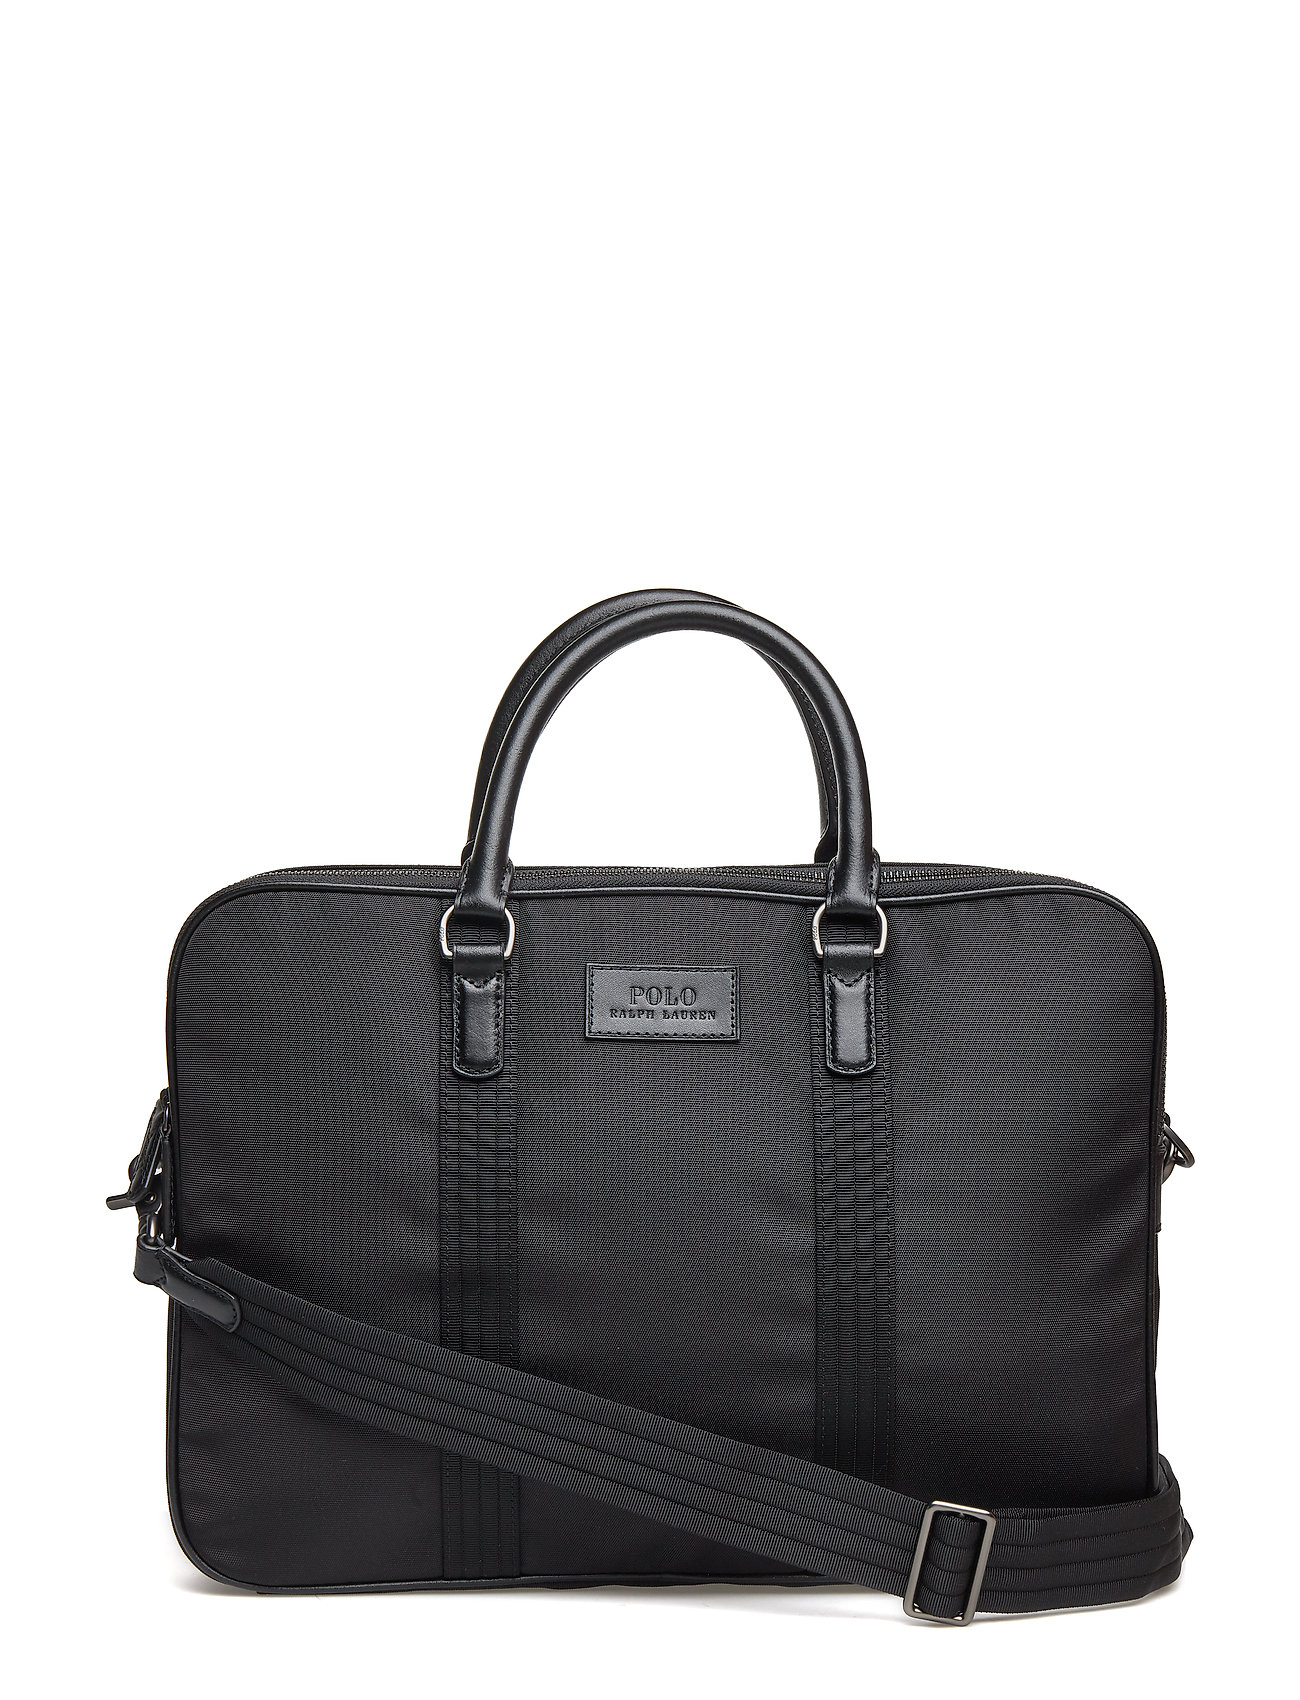 Polo Ralph Lauren Thompson Briefcase